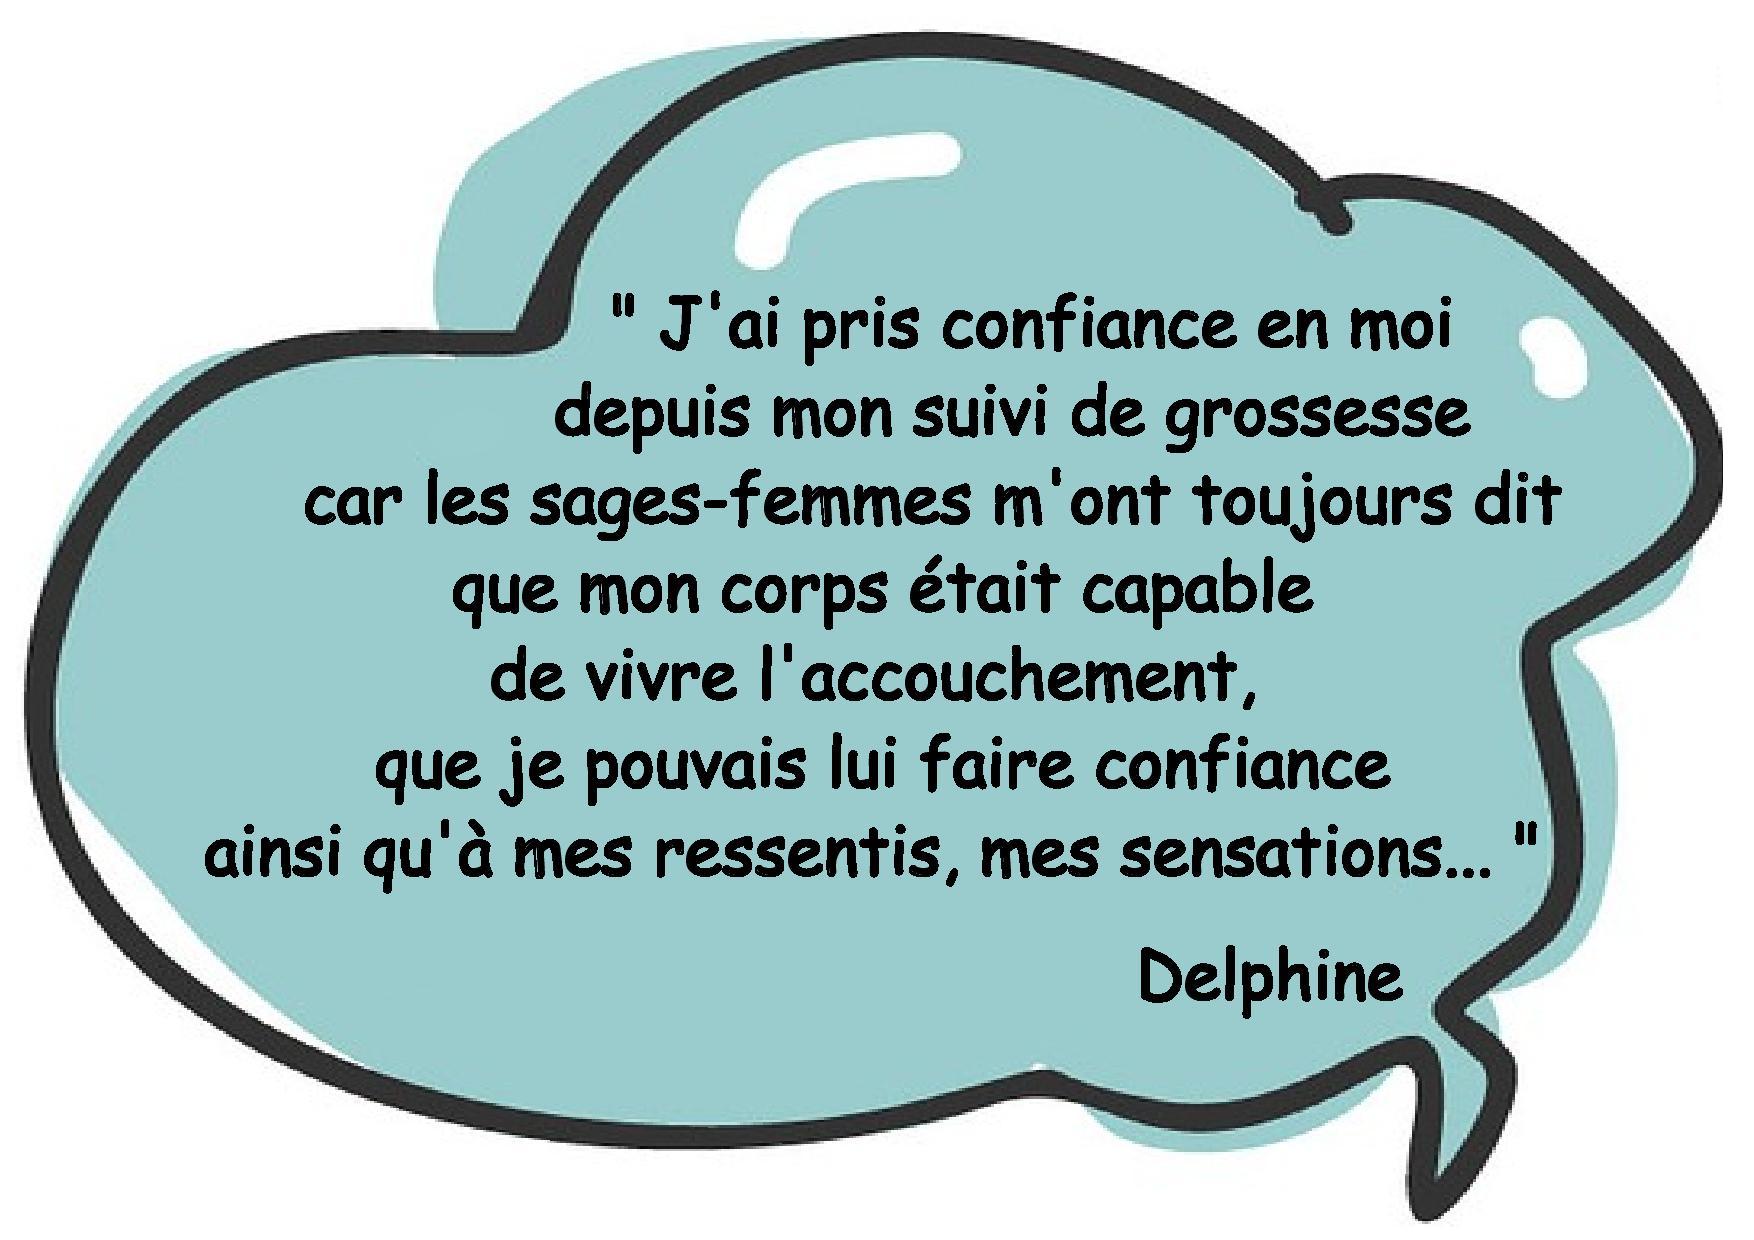 image Delphine.jpg (0.2MB)